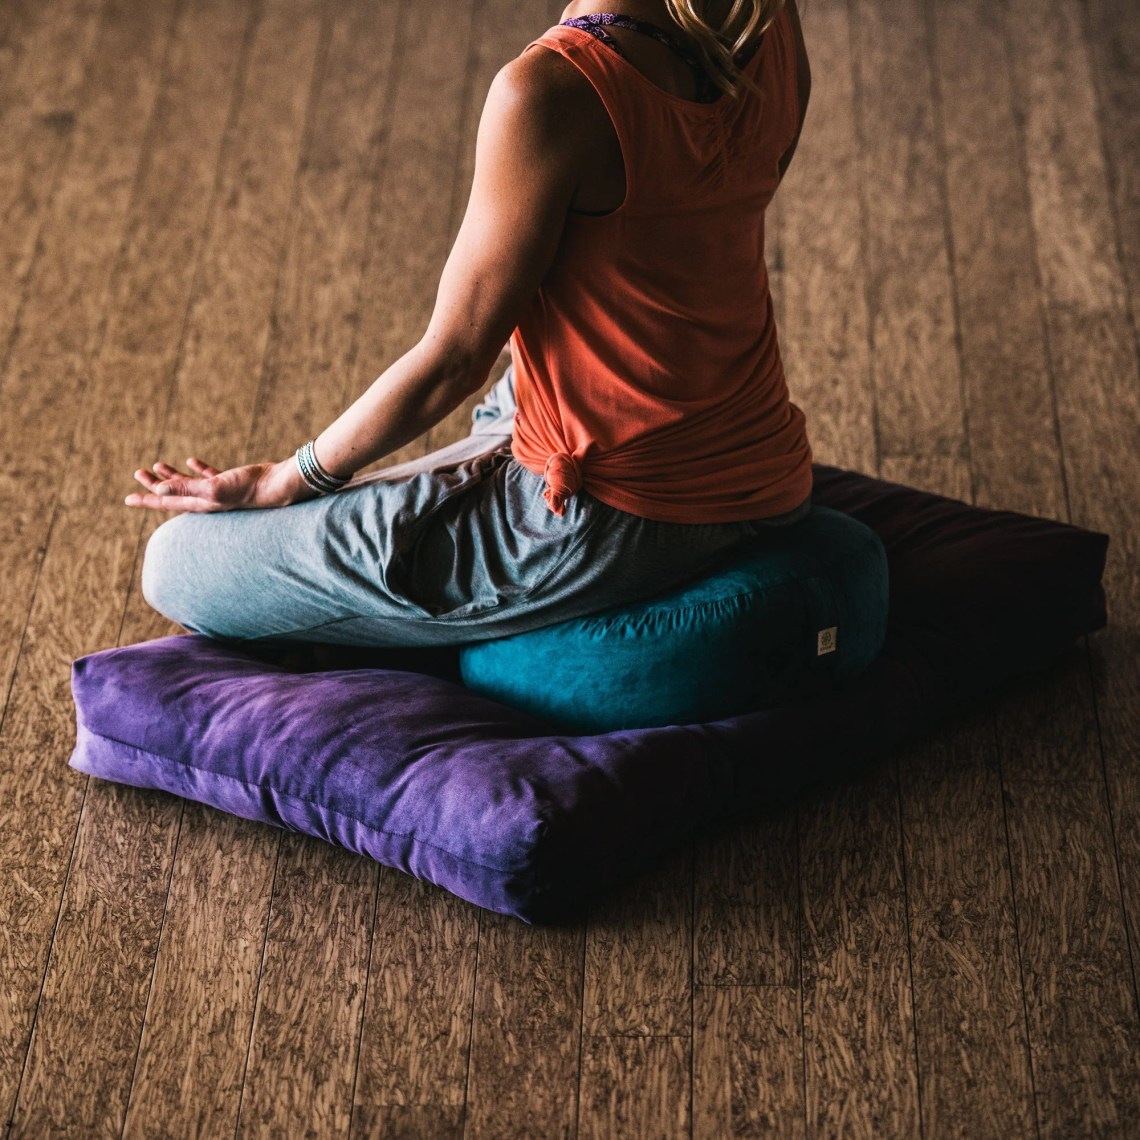 Teal zafu meditation cushion woman sitting on top